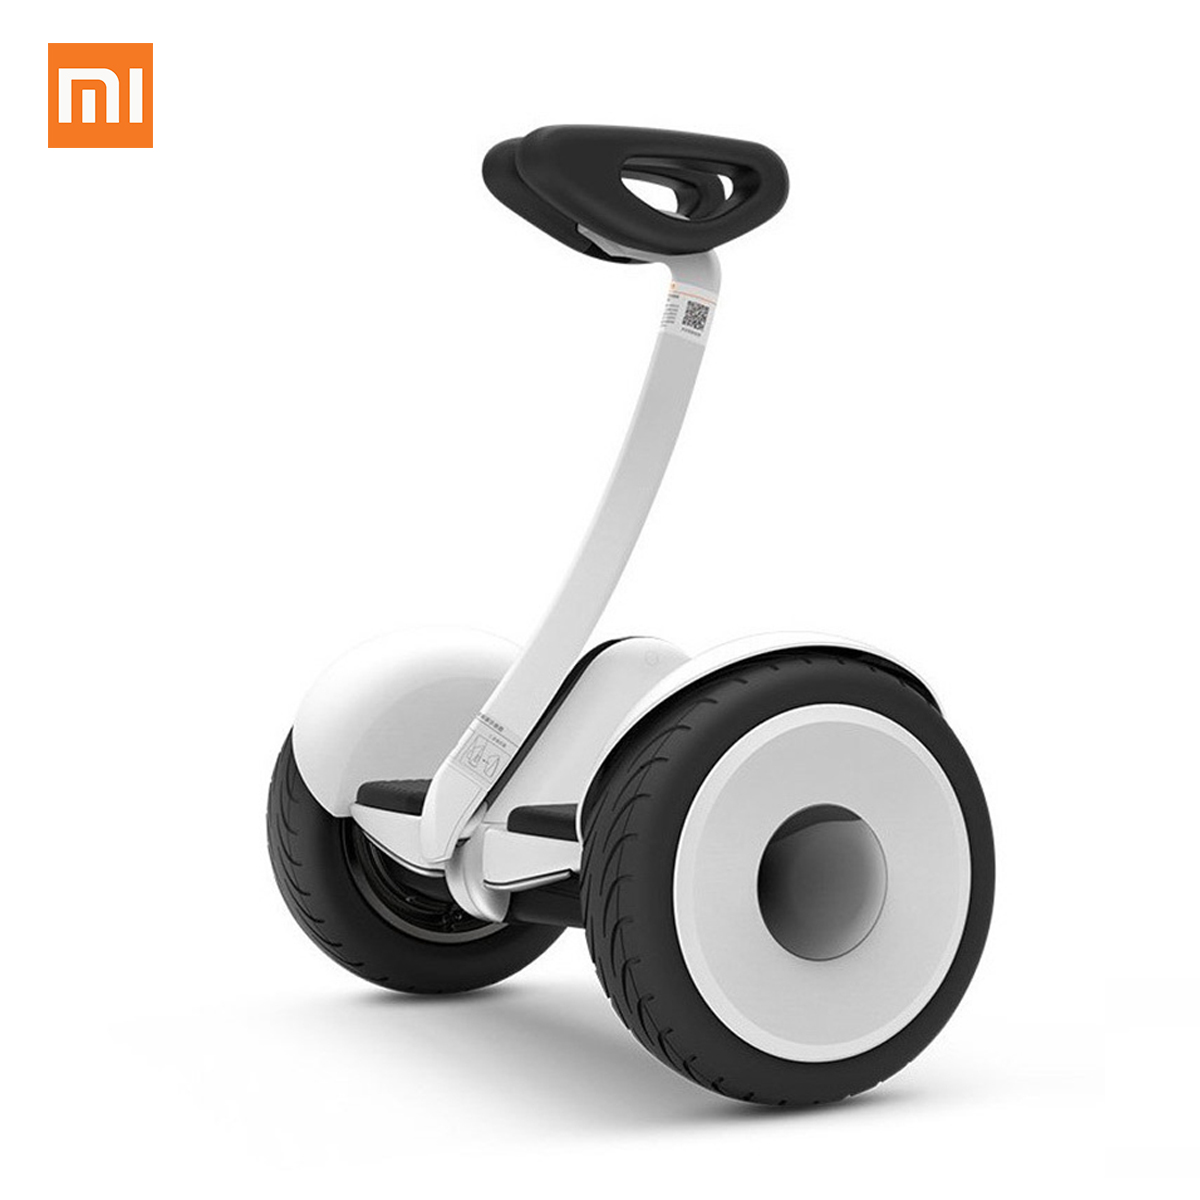 Original Xiaomi Mini Ninebot Smart Self Balance Electric Scooter Two Wheel Skateboard 10 Inch